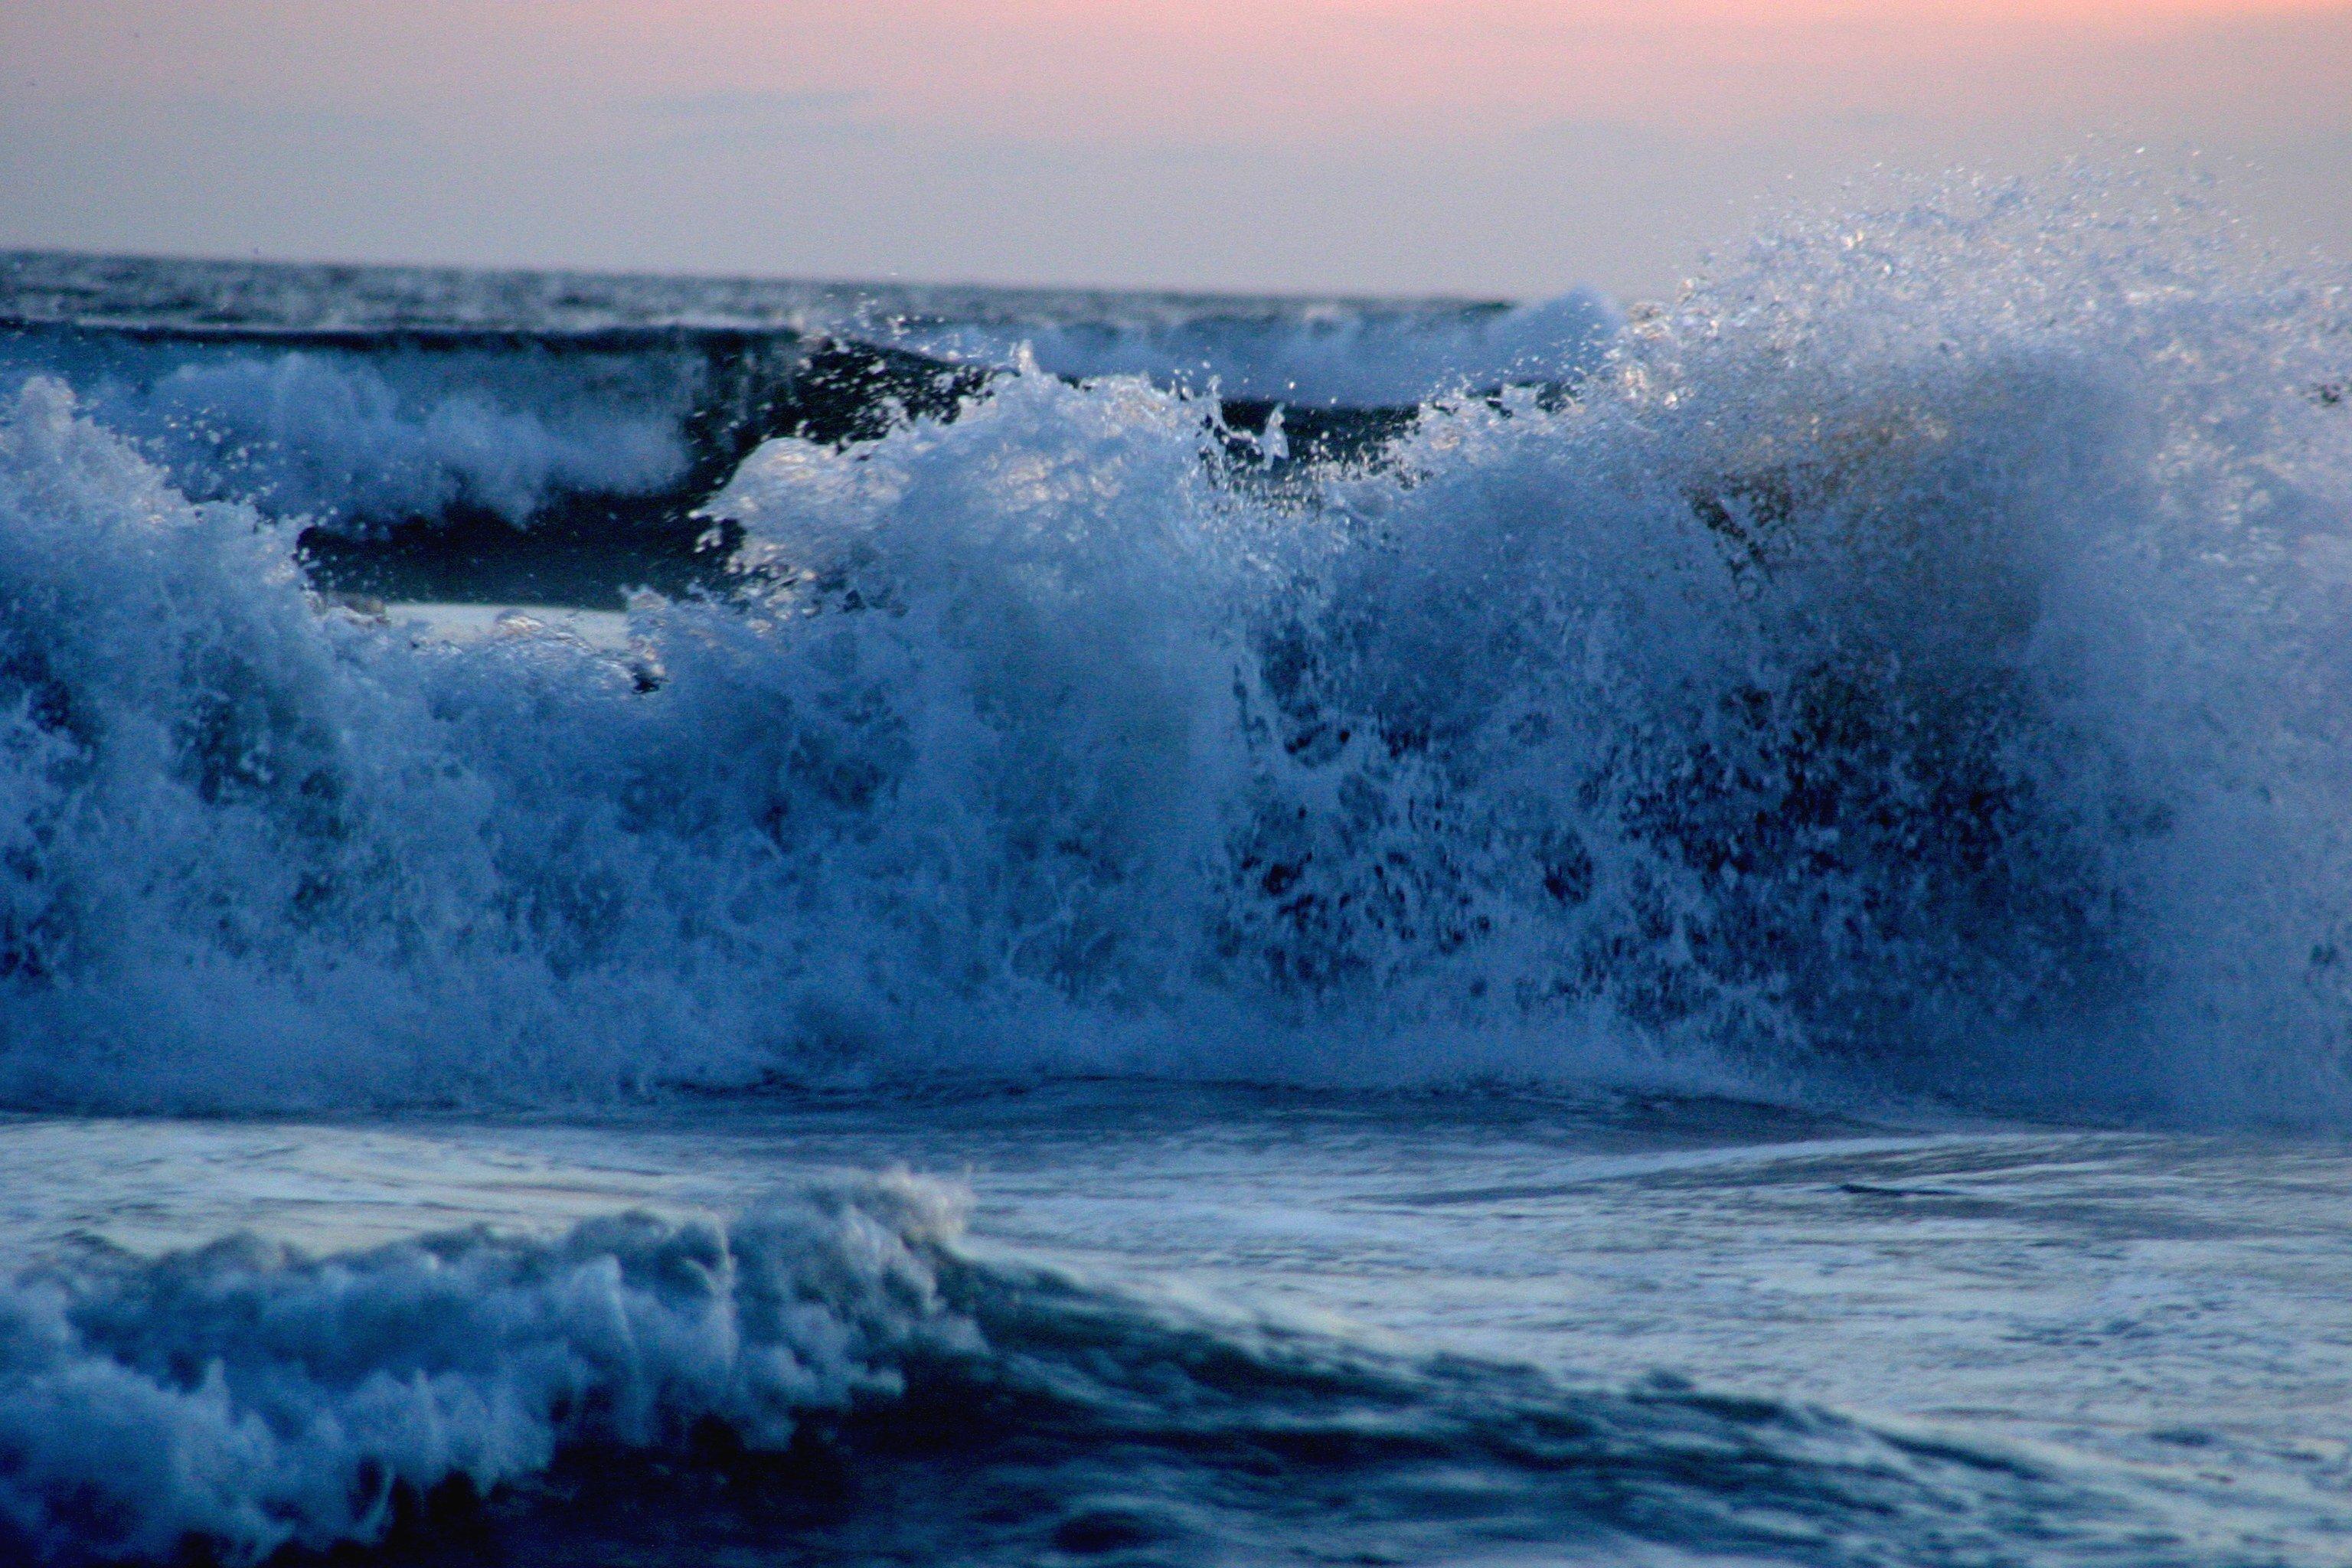 Night King Hd Wallpaper File Wave Acapulco Breaking Jpg Wikipedia